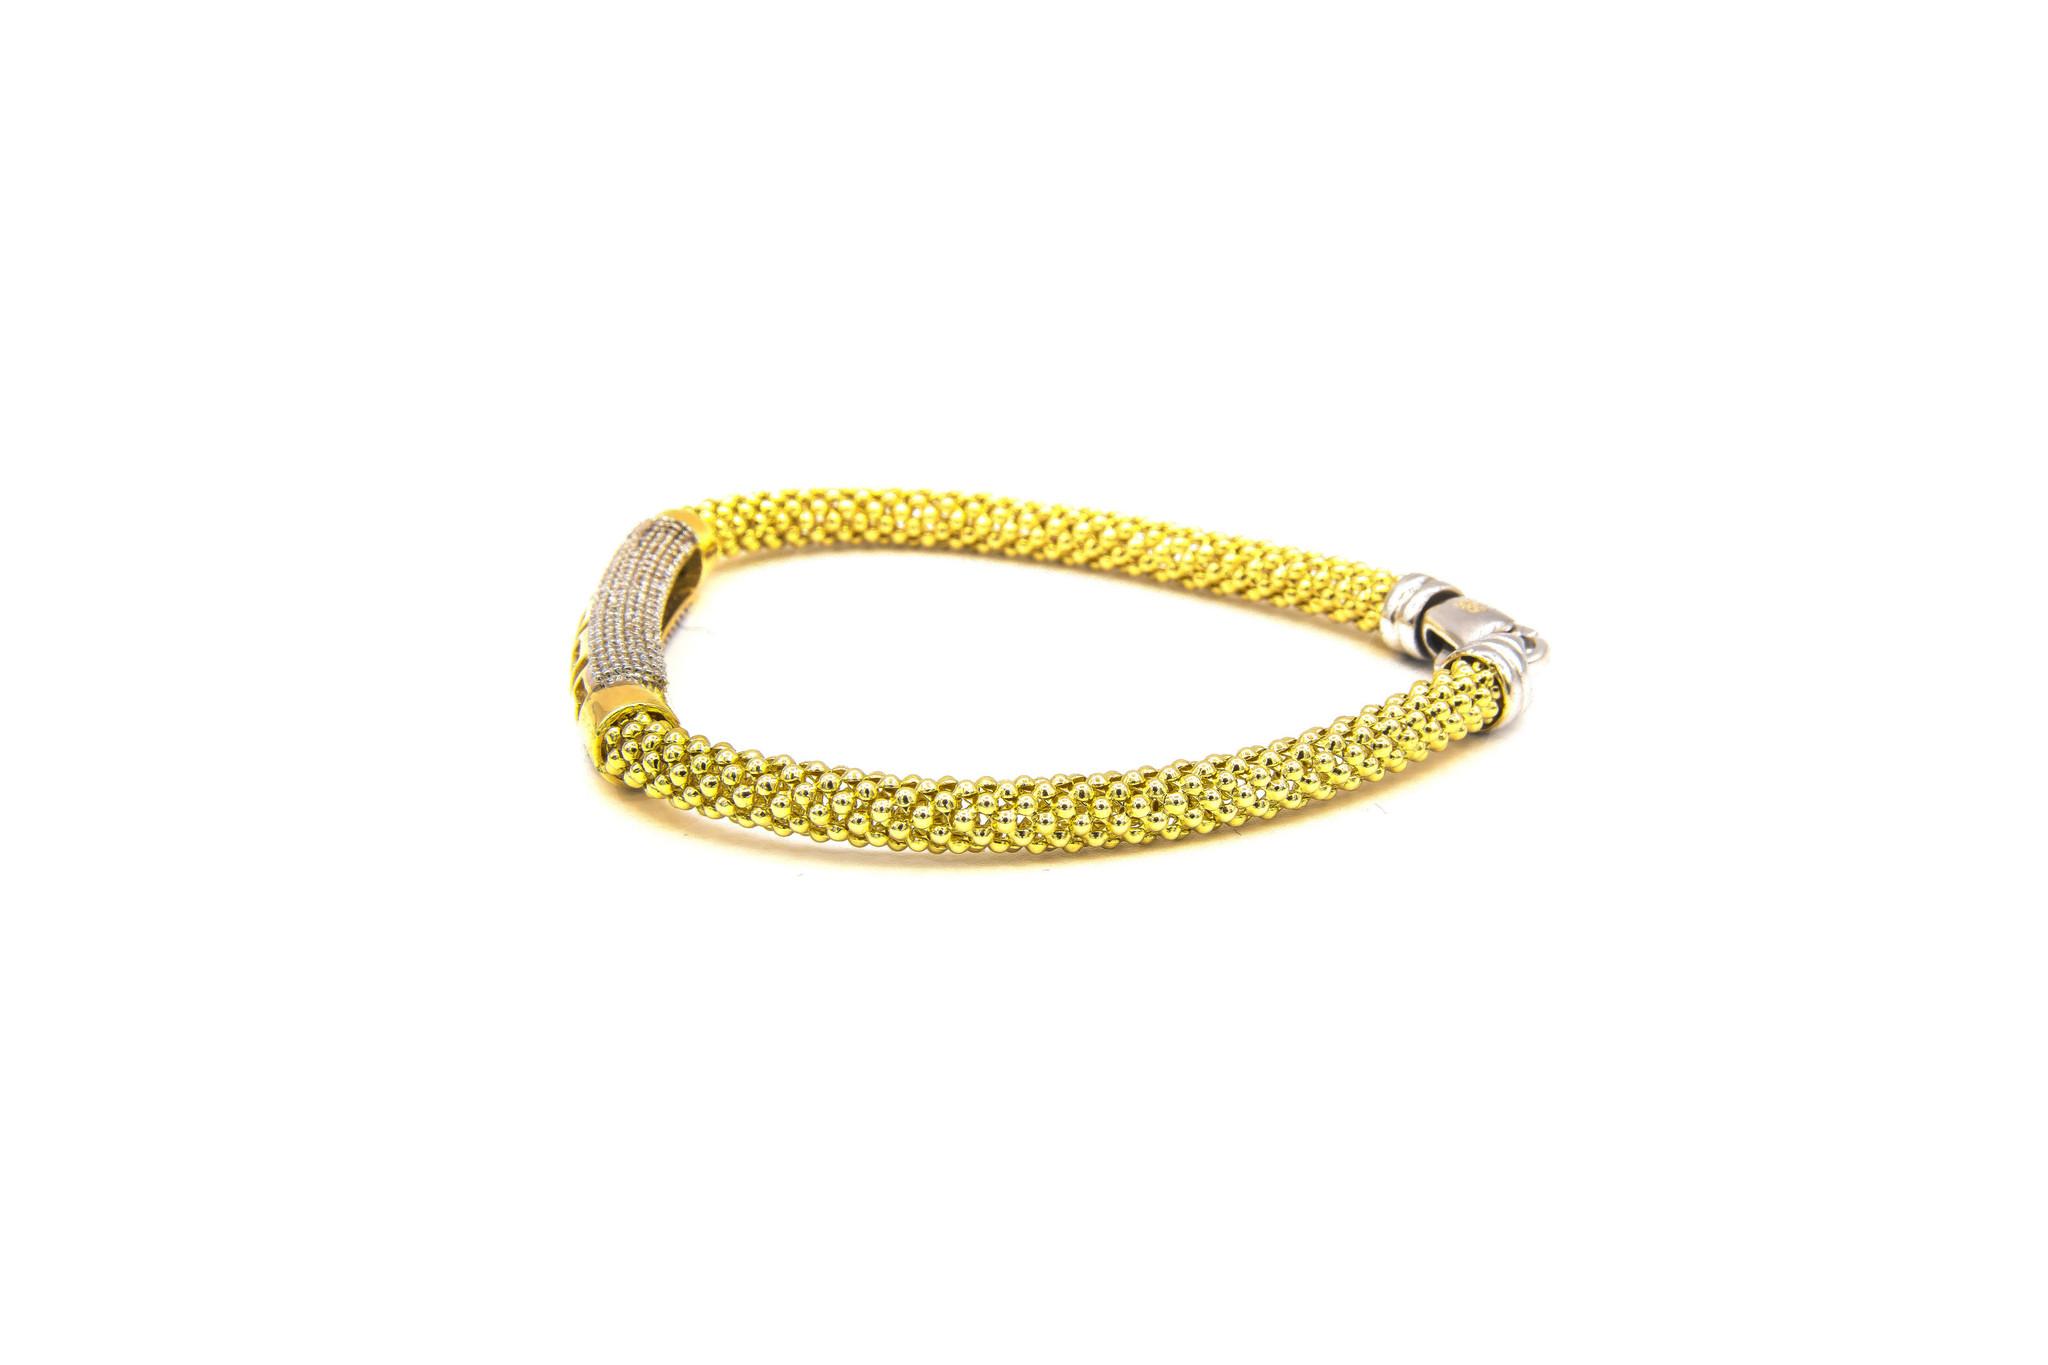 Armband halve slavenband versace met zirkonia's en flexibele boto ketti-6